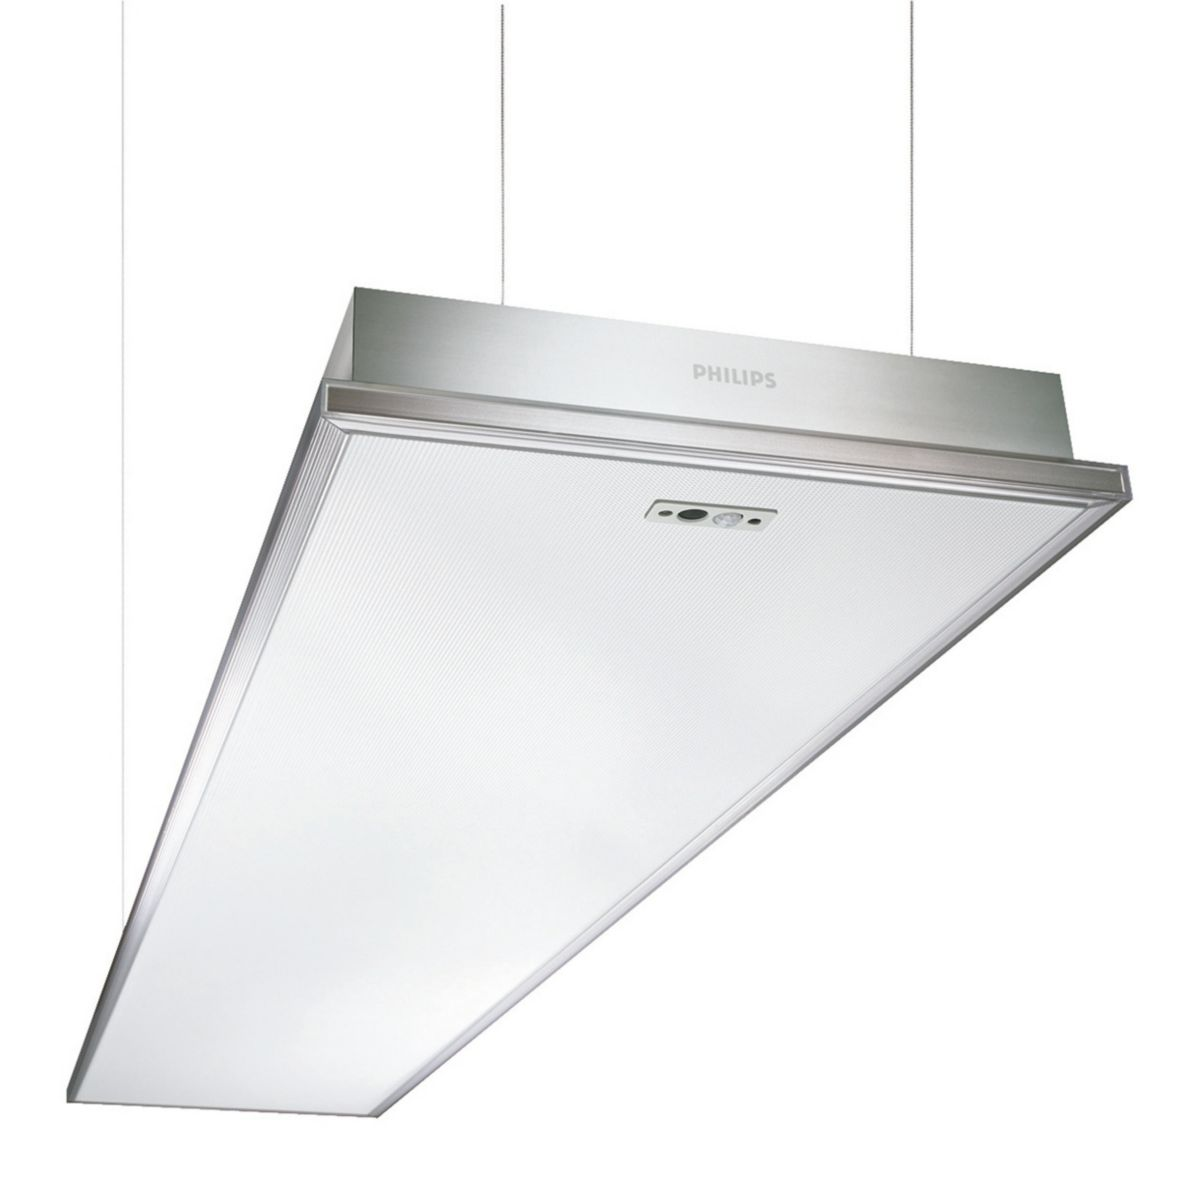 Plafoniere Led Philips : Savio tps c suspended philips lighting